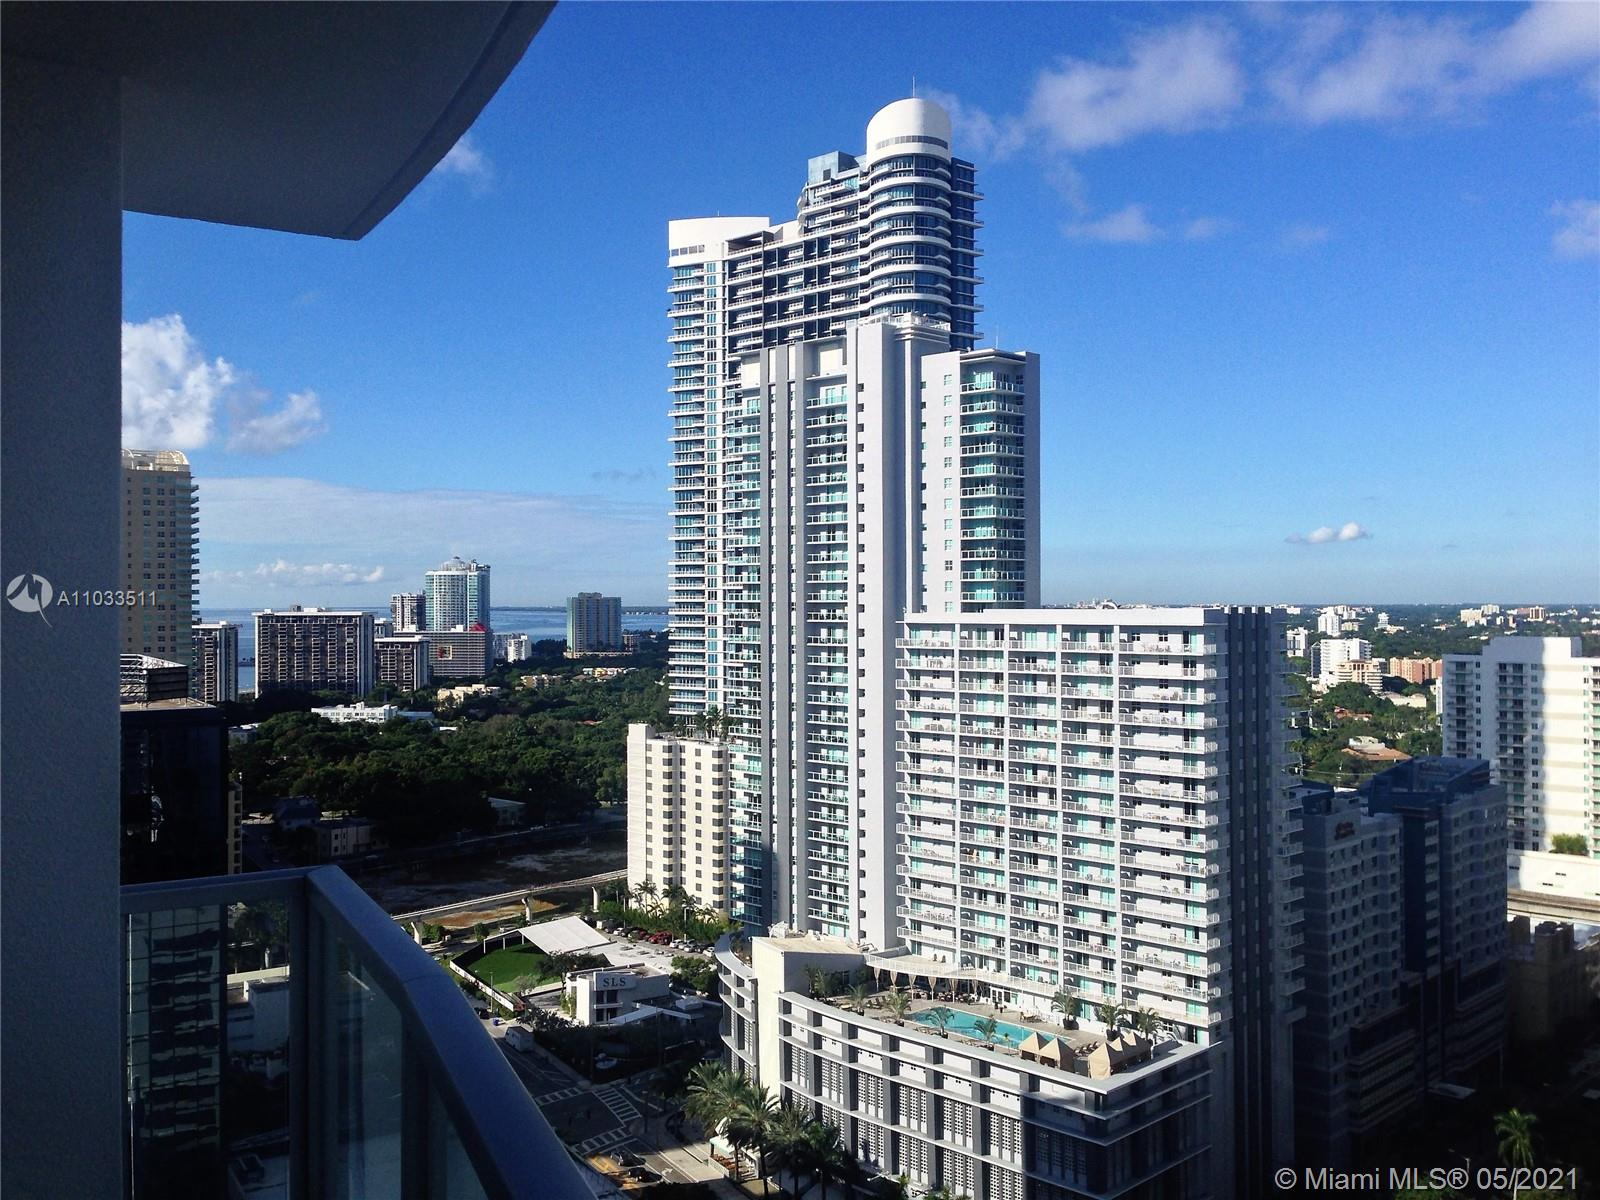 1060 Brickell West Tower #2515 - 1060 Brickell Ave #2515, Miami, FL 33131